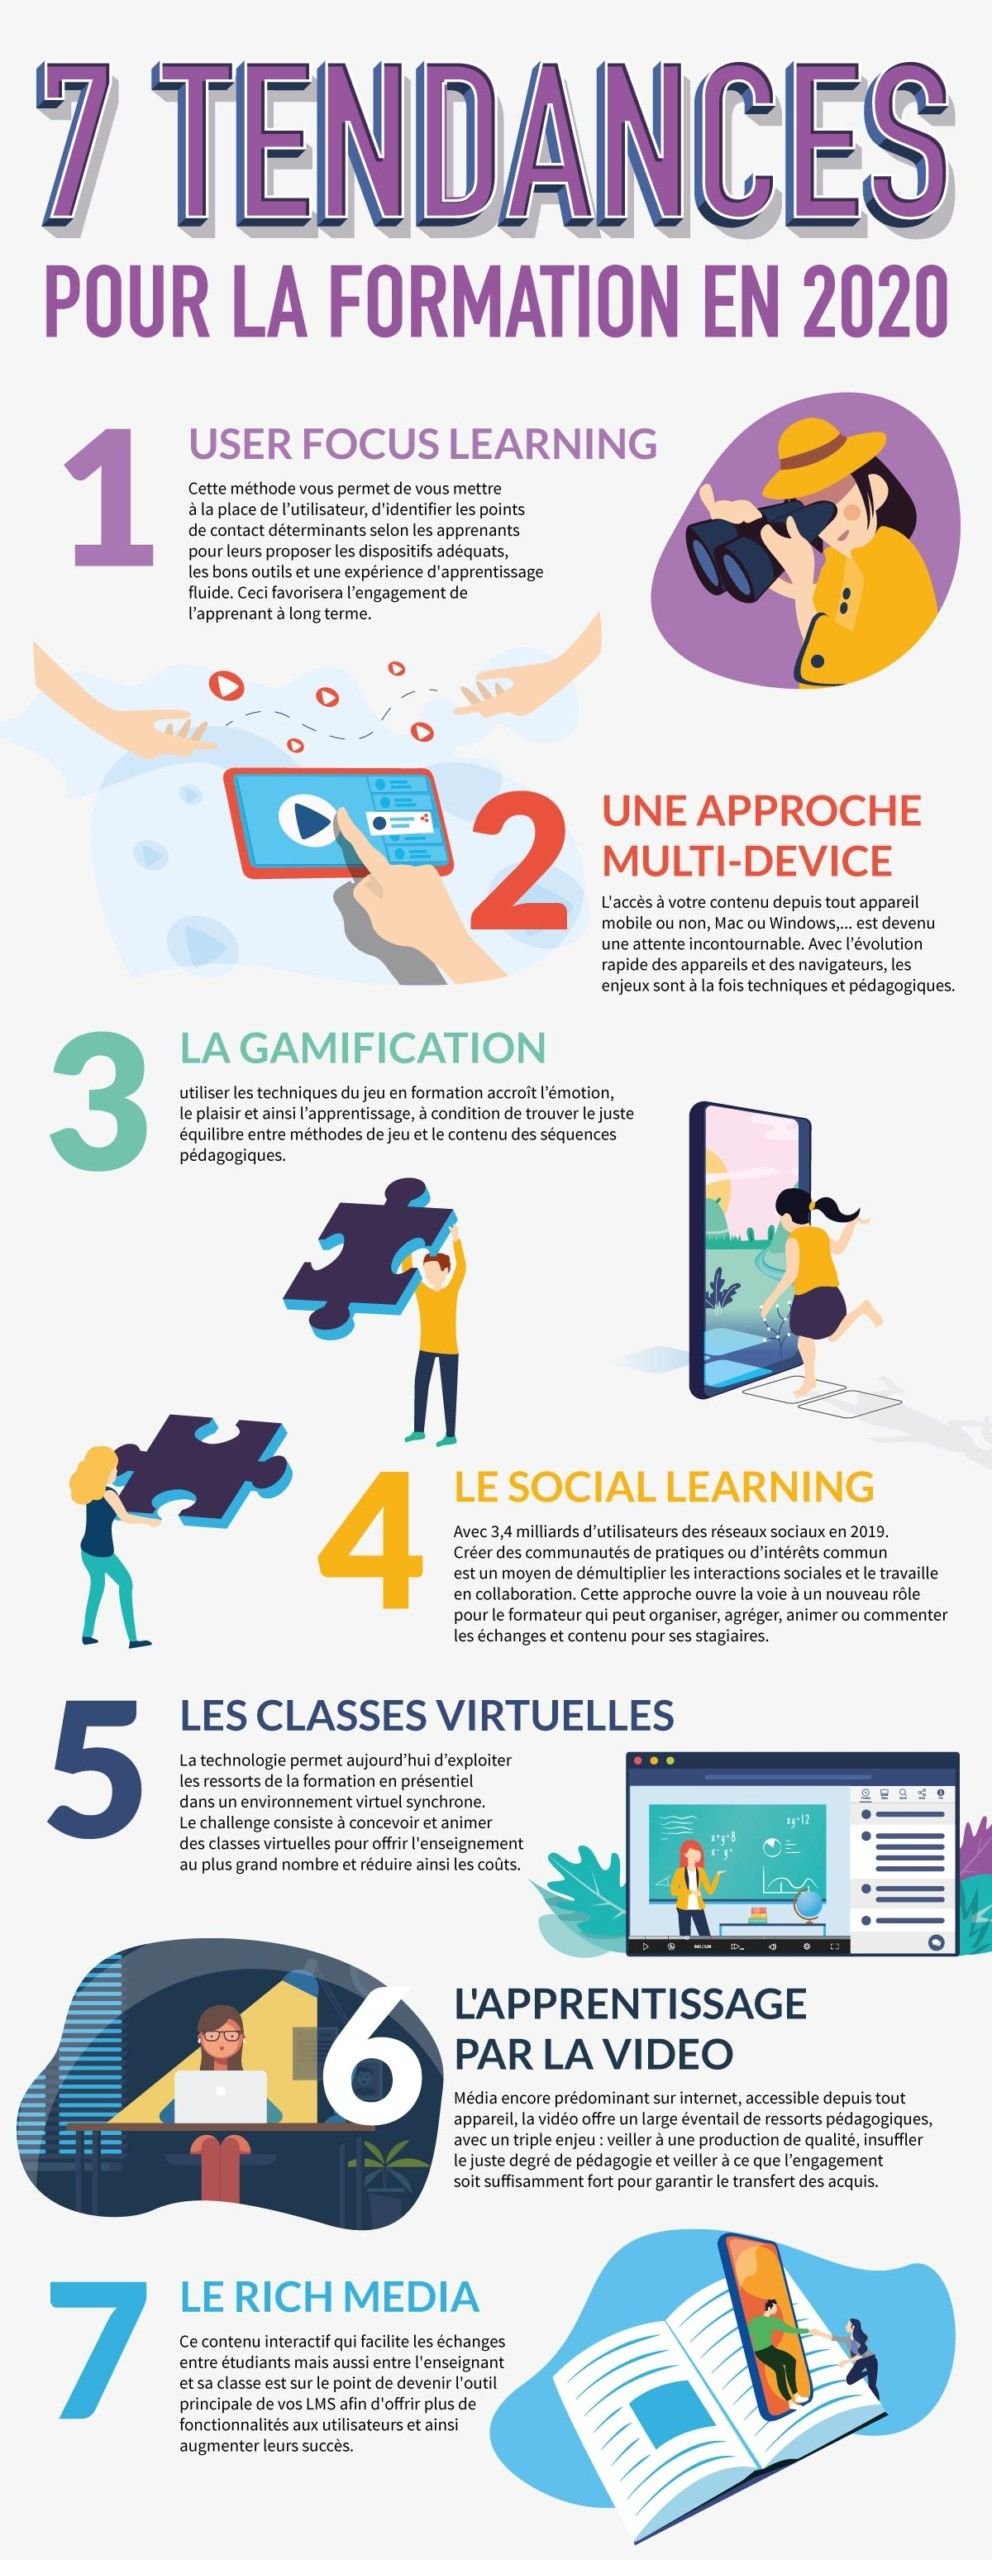 7 Tendances Pour La Formation En 2020 Ubicast La Digital Learning Academy Digital Learning Change Management Education